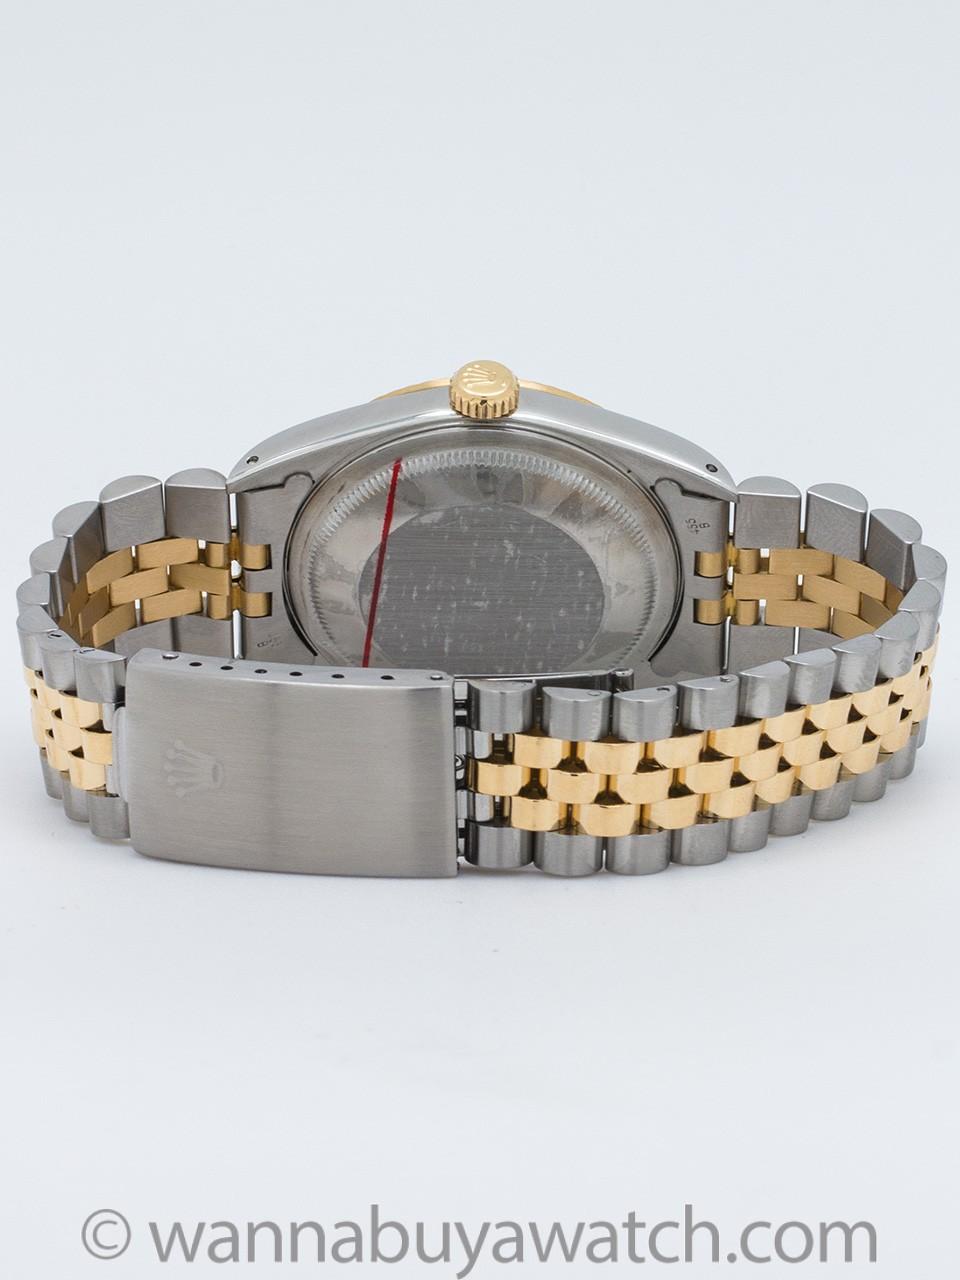 Rolex Datejust Tiffany & Co ref 16233 SS/18K circa 1990